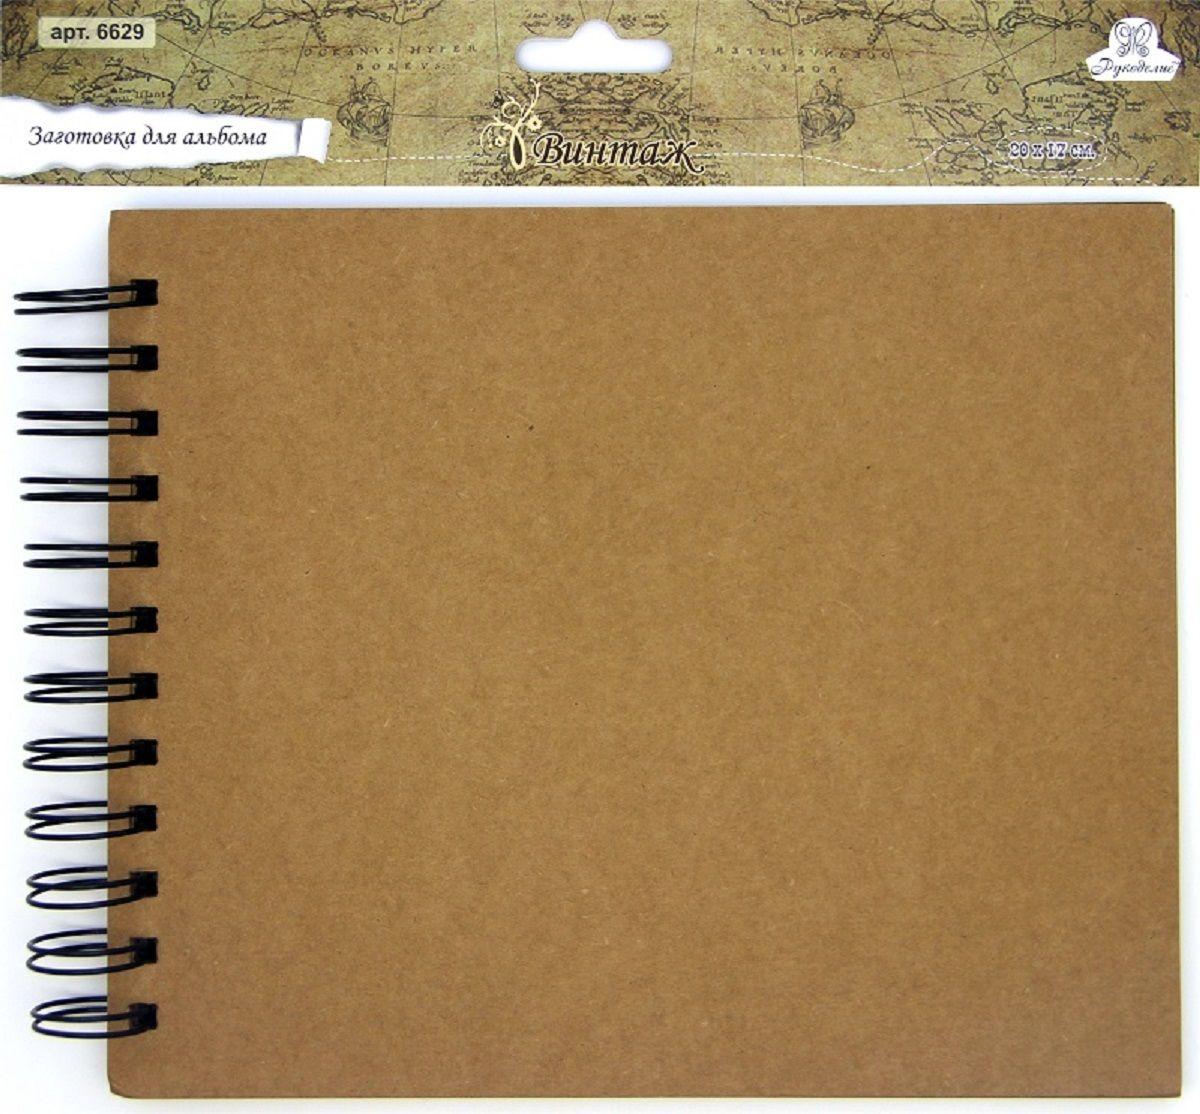 Заготовка для альбома Рукоделие Винтаж, 20 х 17 см бумага для декупажа рукоделие винтаж 50 х 39 5 см 6 листов